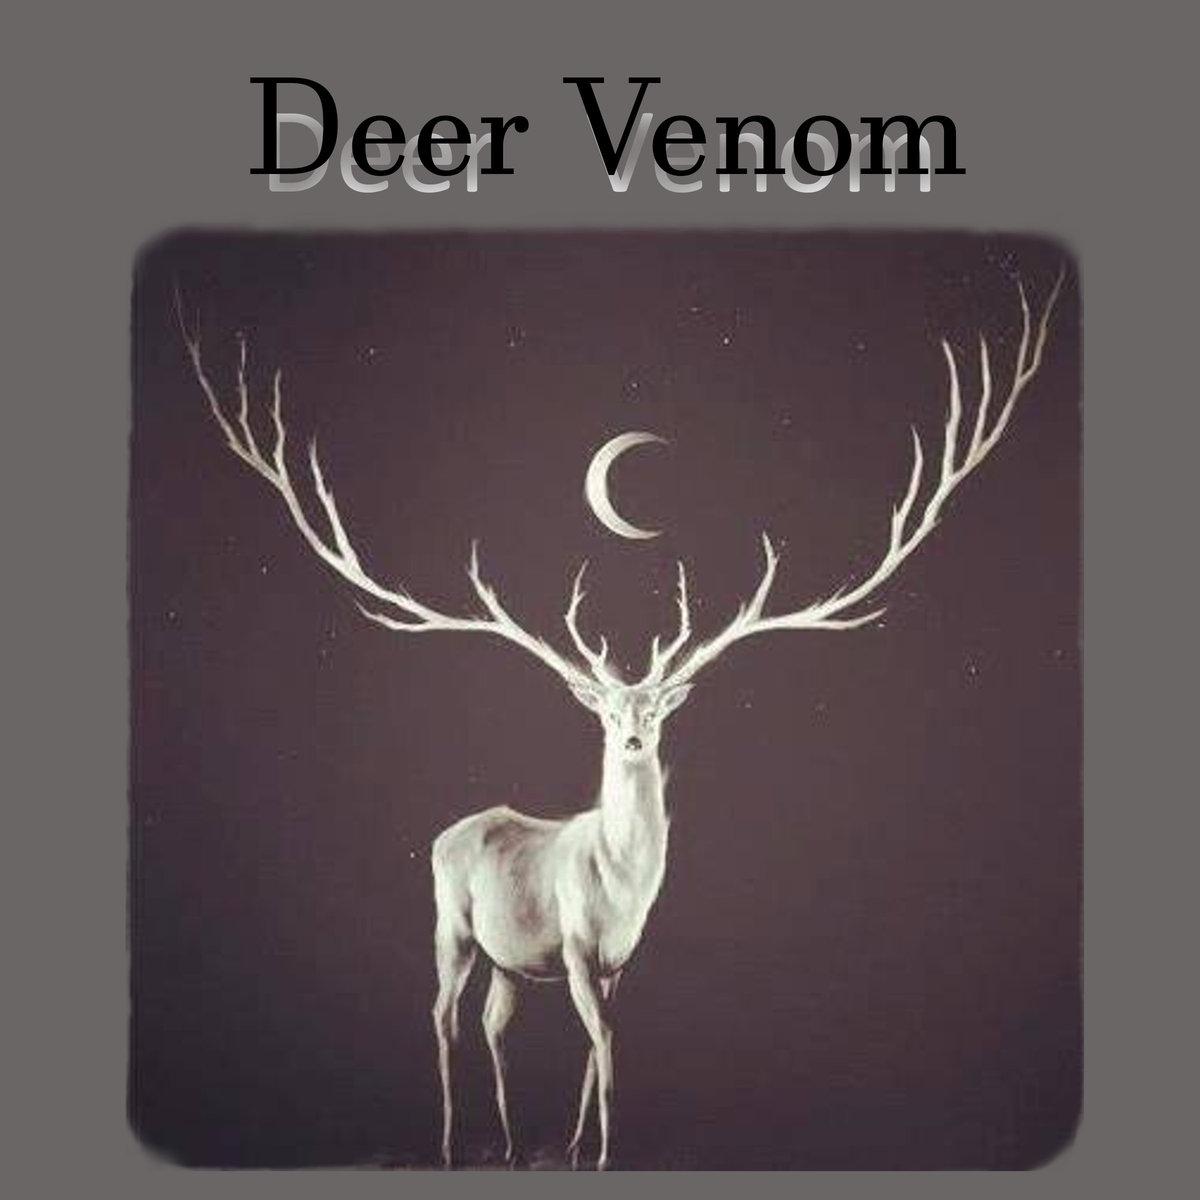 Deer venom cover 1200x1200.jpg